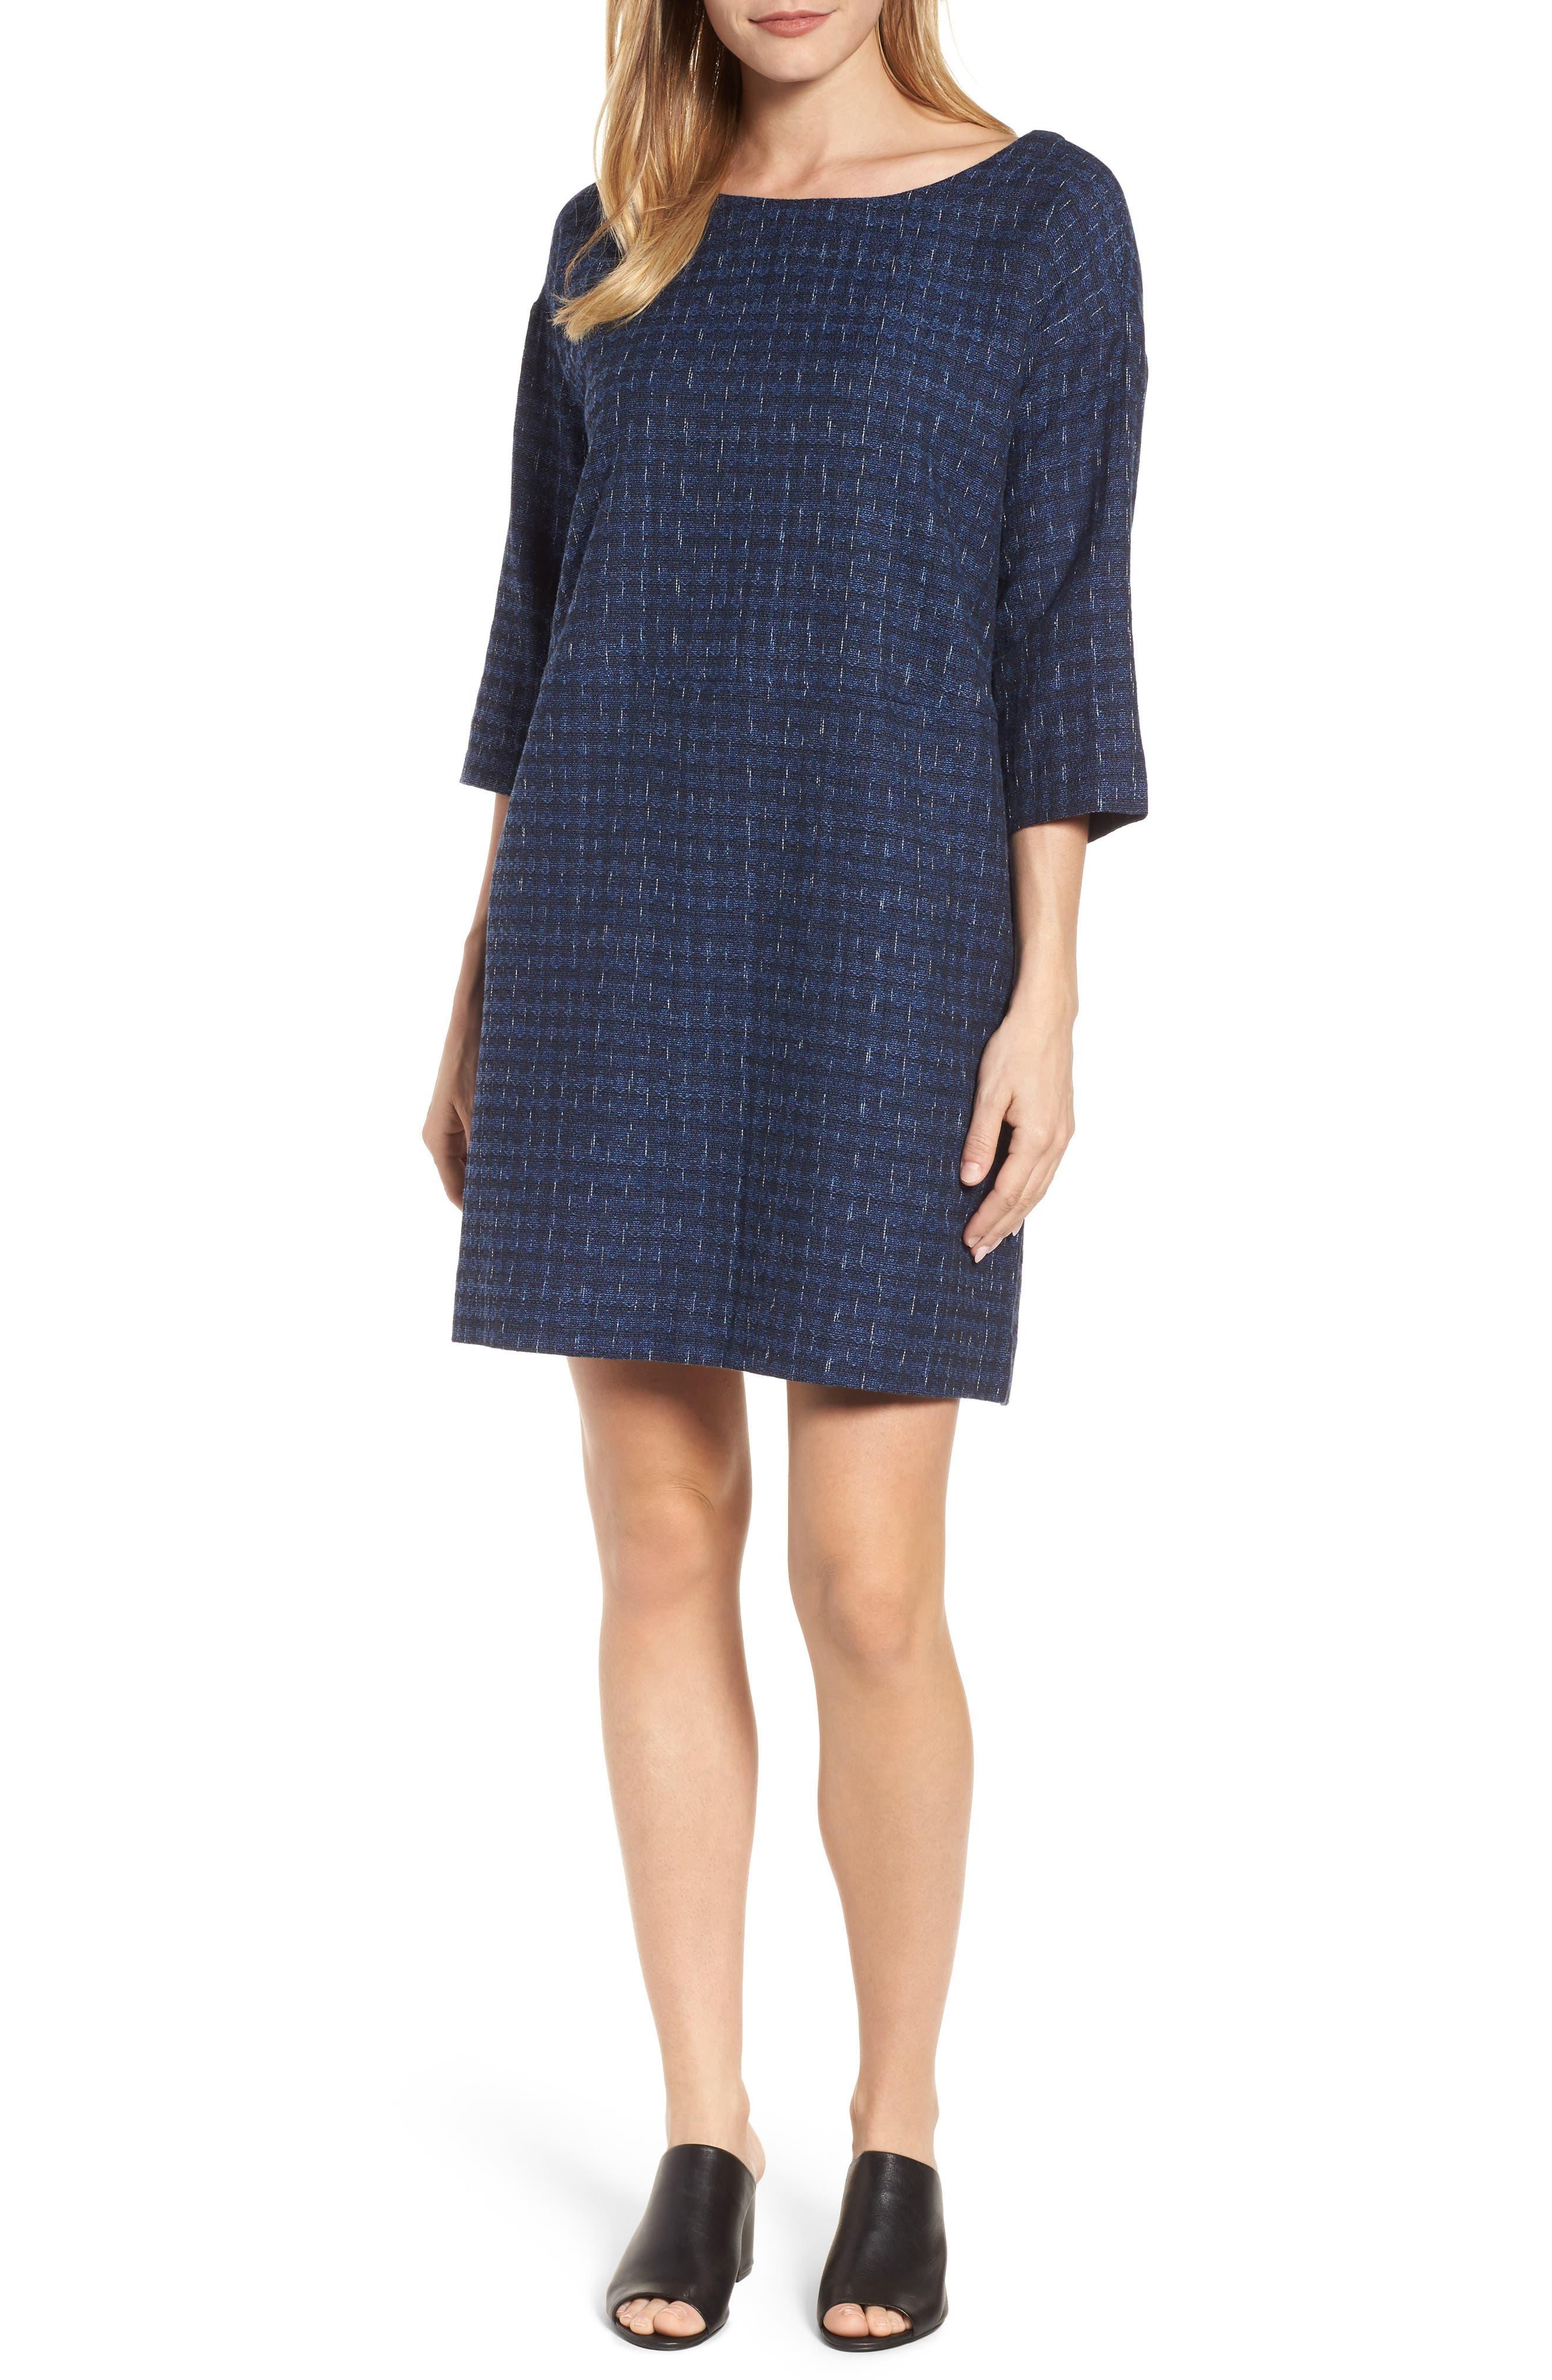 Alternate Image 1 Selected - Eileen Fisher Organic Cotton Jacquard Shift Dress